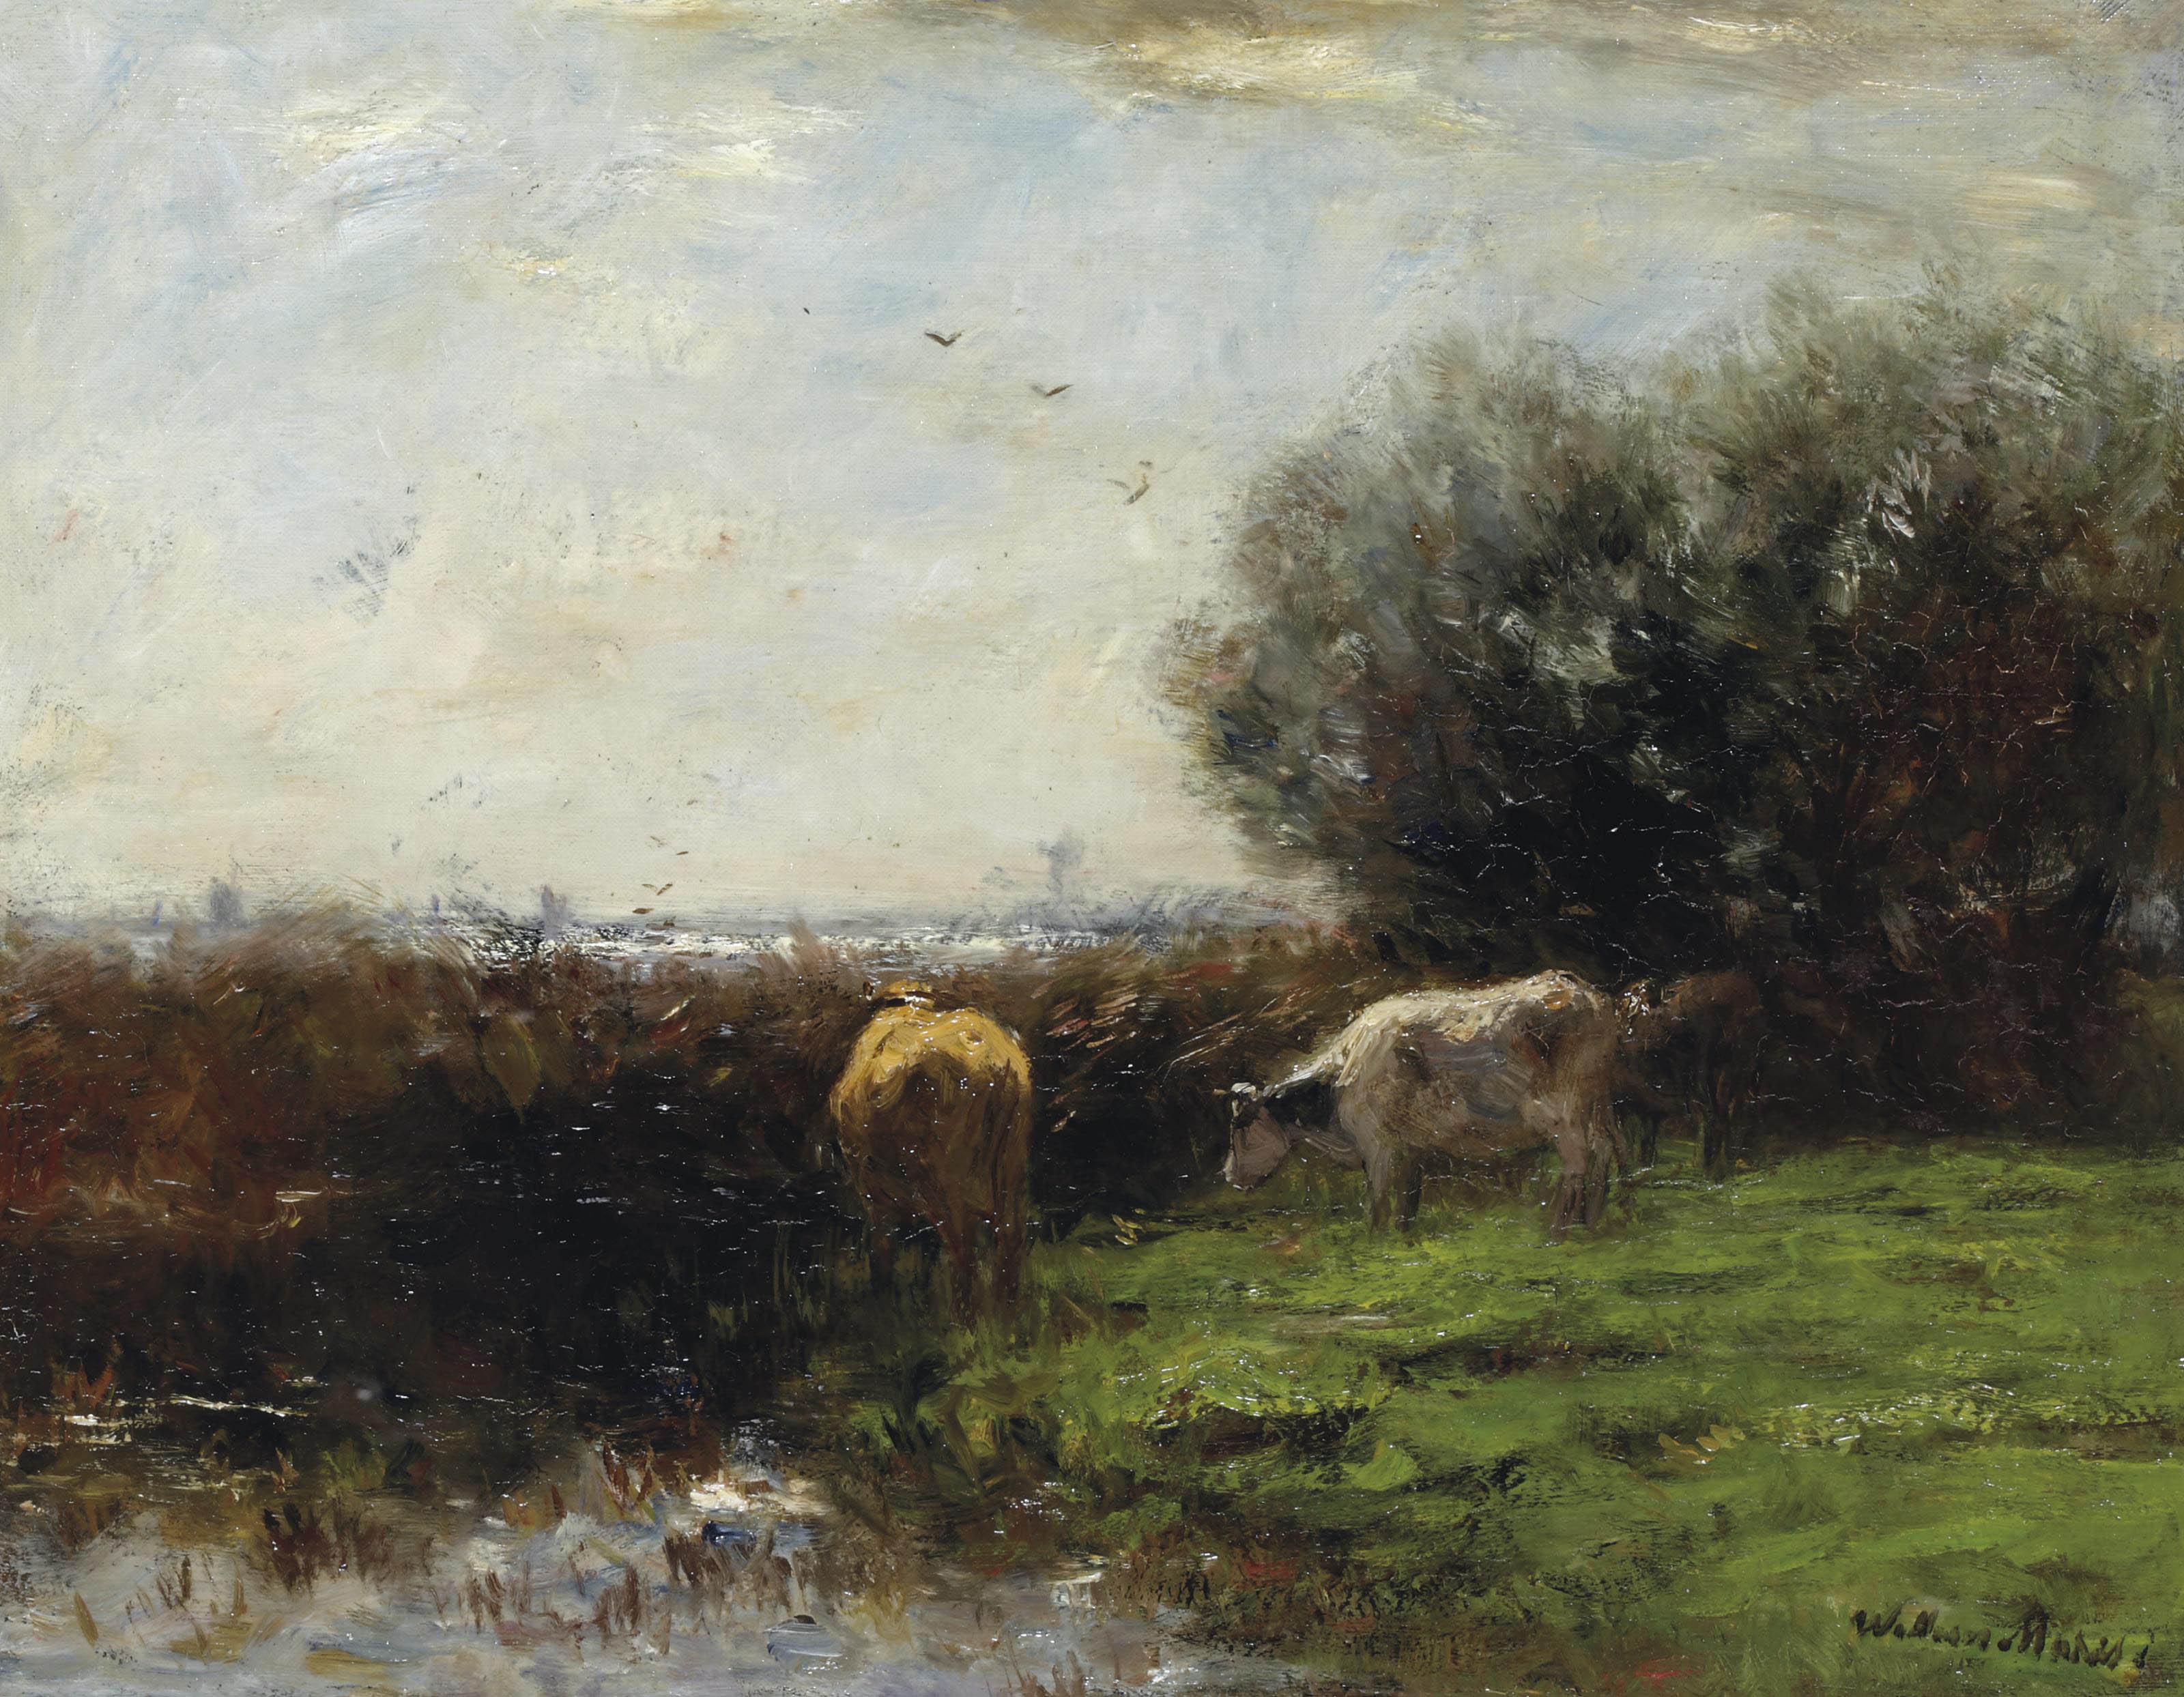 Cows in Dutch polder landscape